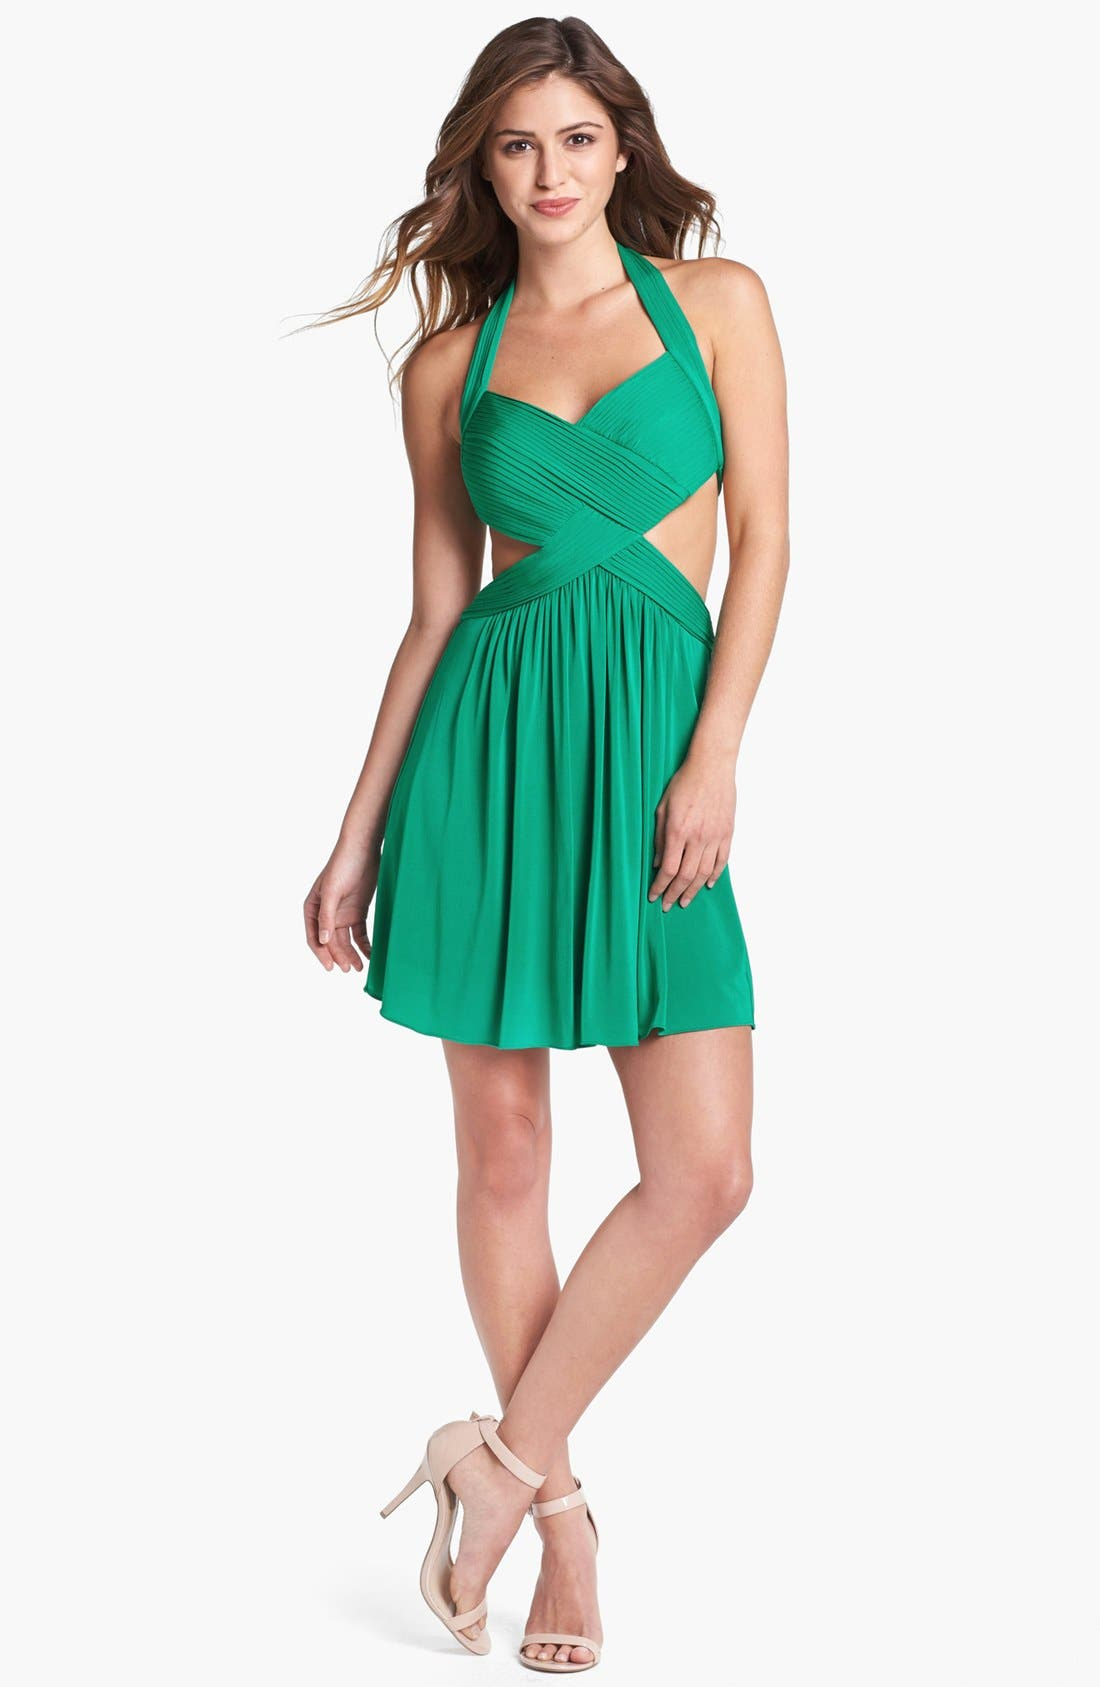 Main Image - BCBGMAXAZRIA 'Shea' Cutout Halter Fit & Flare Dress